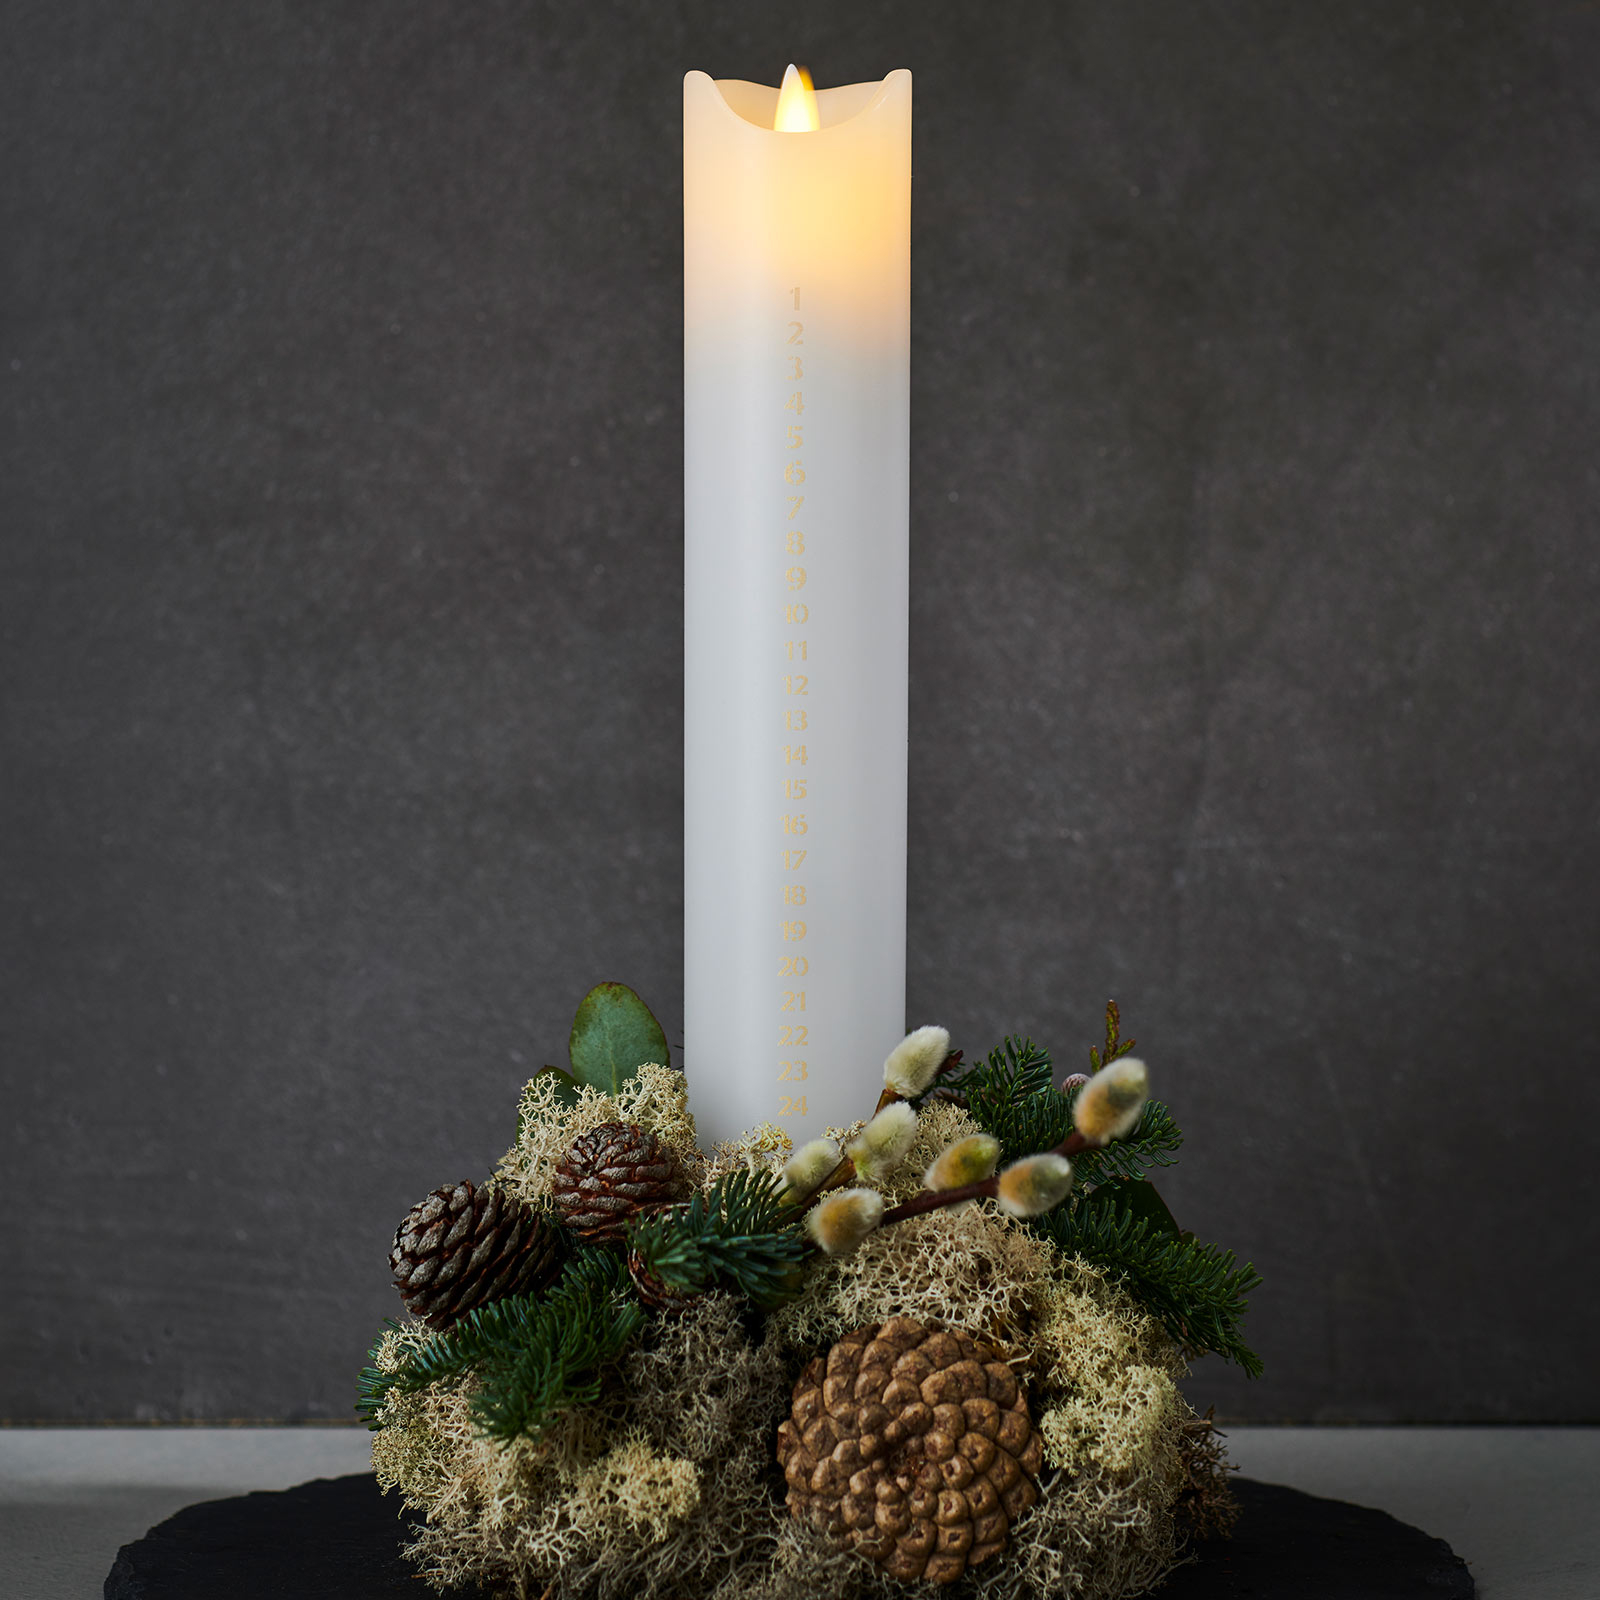 LED svíčka Sara Calendar, bílá/zlatá, výška 29 cm